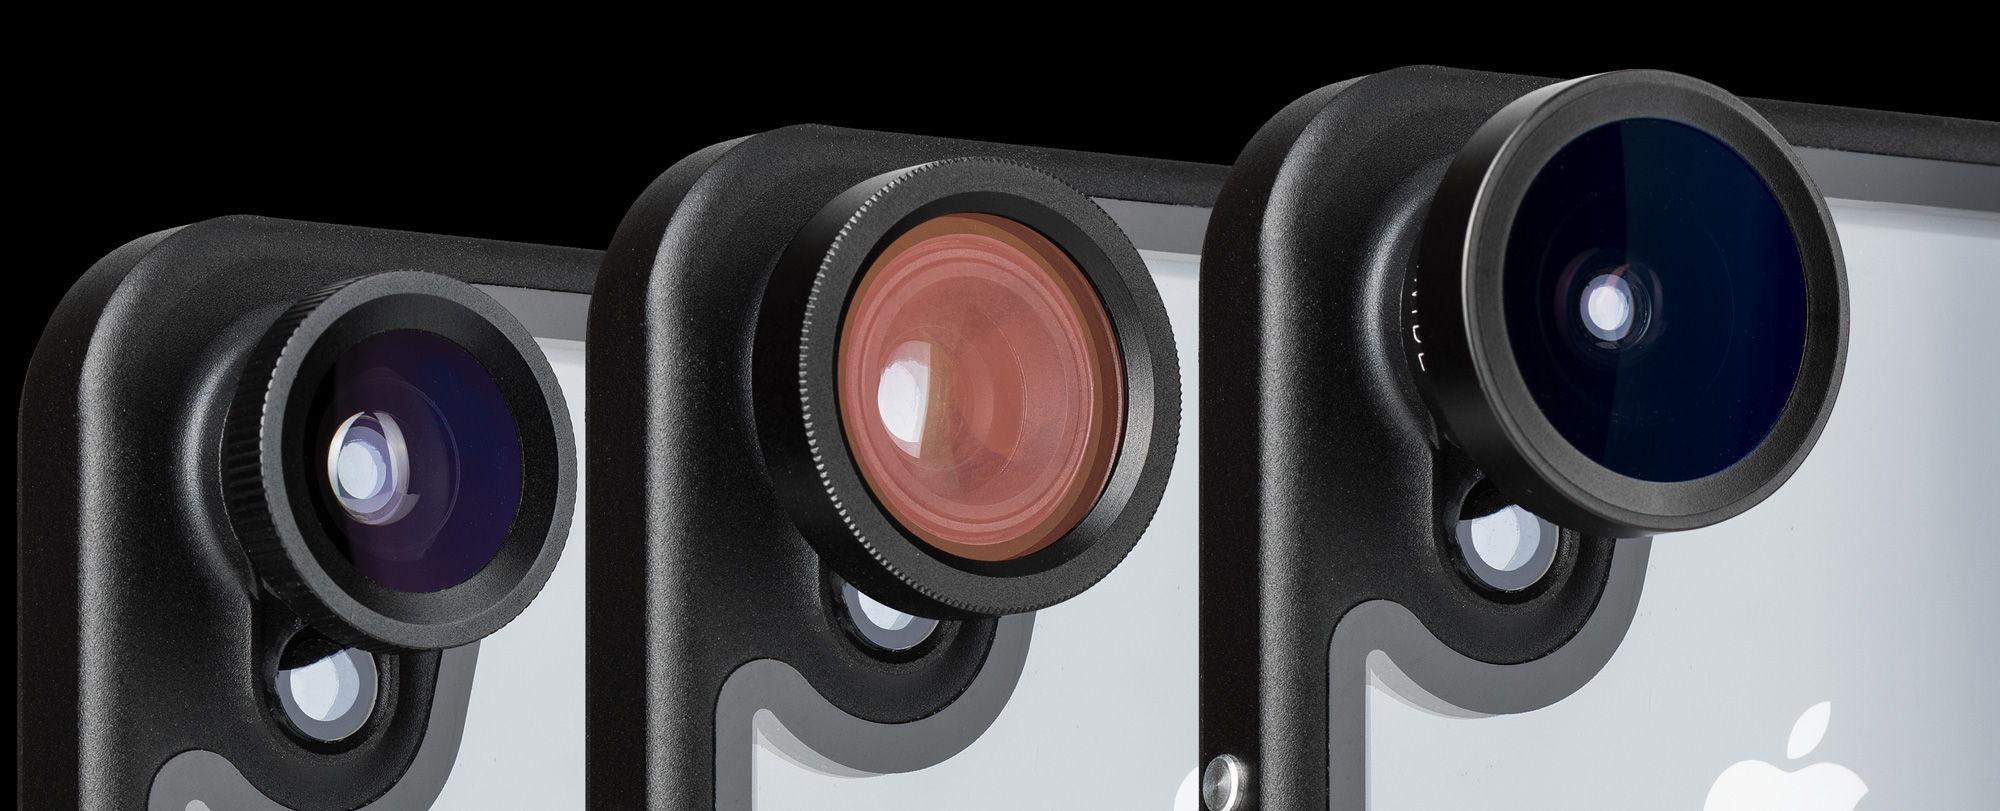 hitcase pro waterproof iphone case with truelux optics lenses